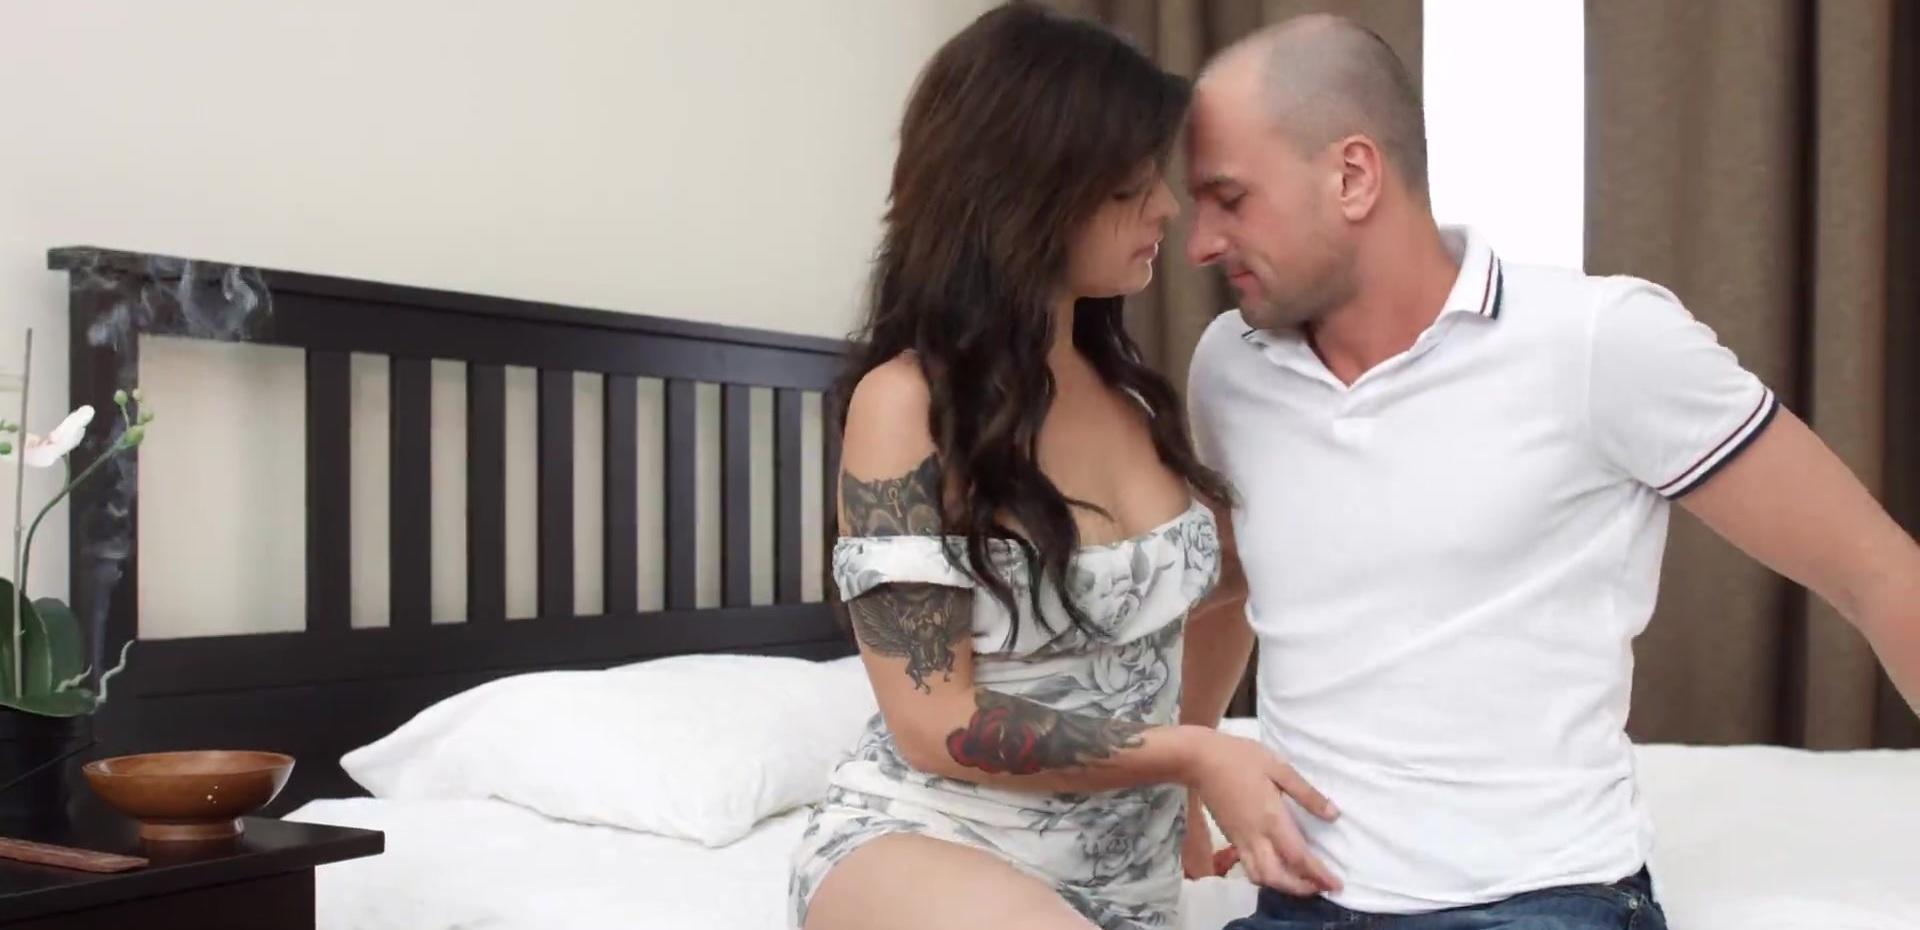 X Sensual Rebecca Rainbow Oiled Up Erotic Surprise